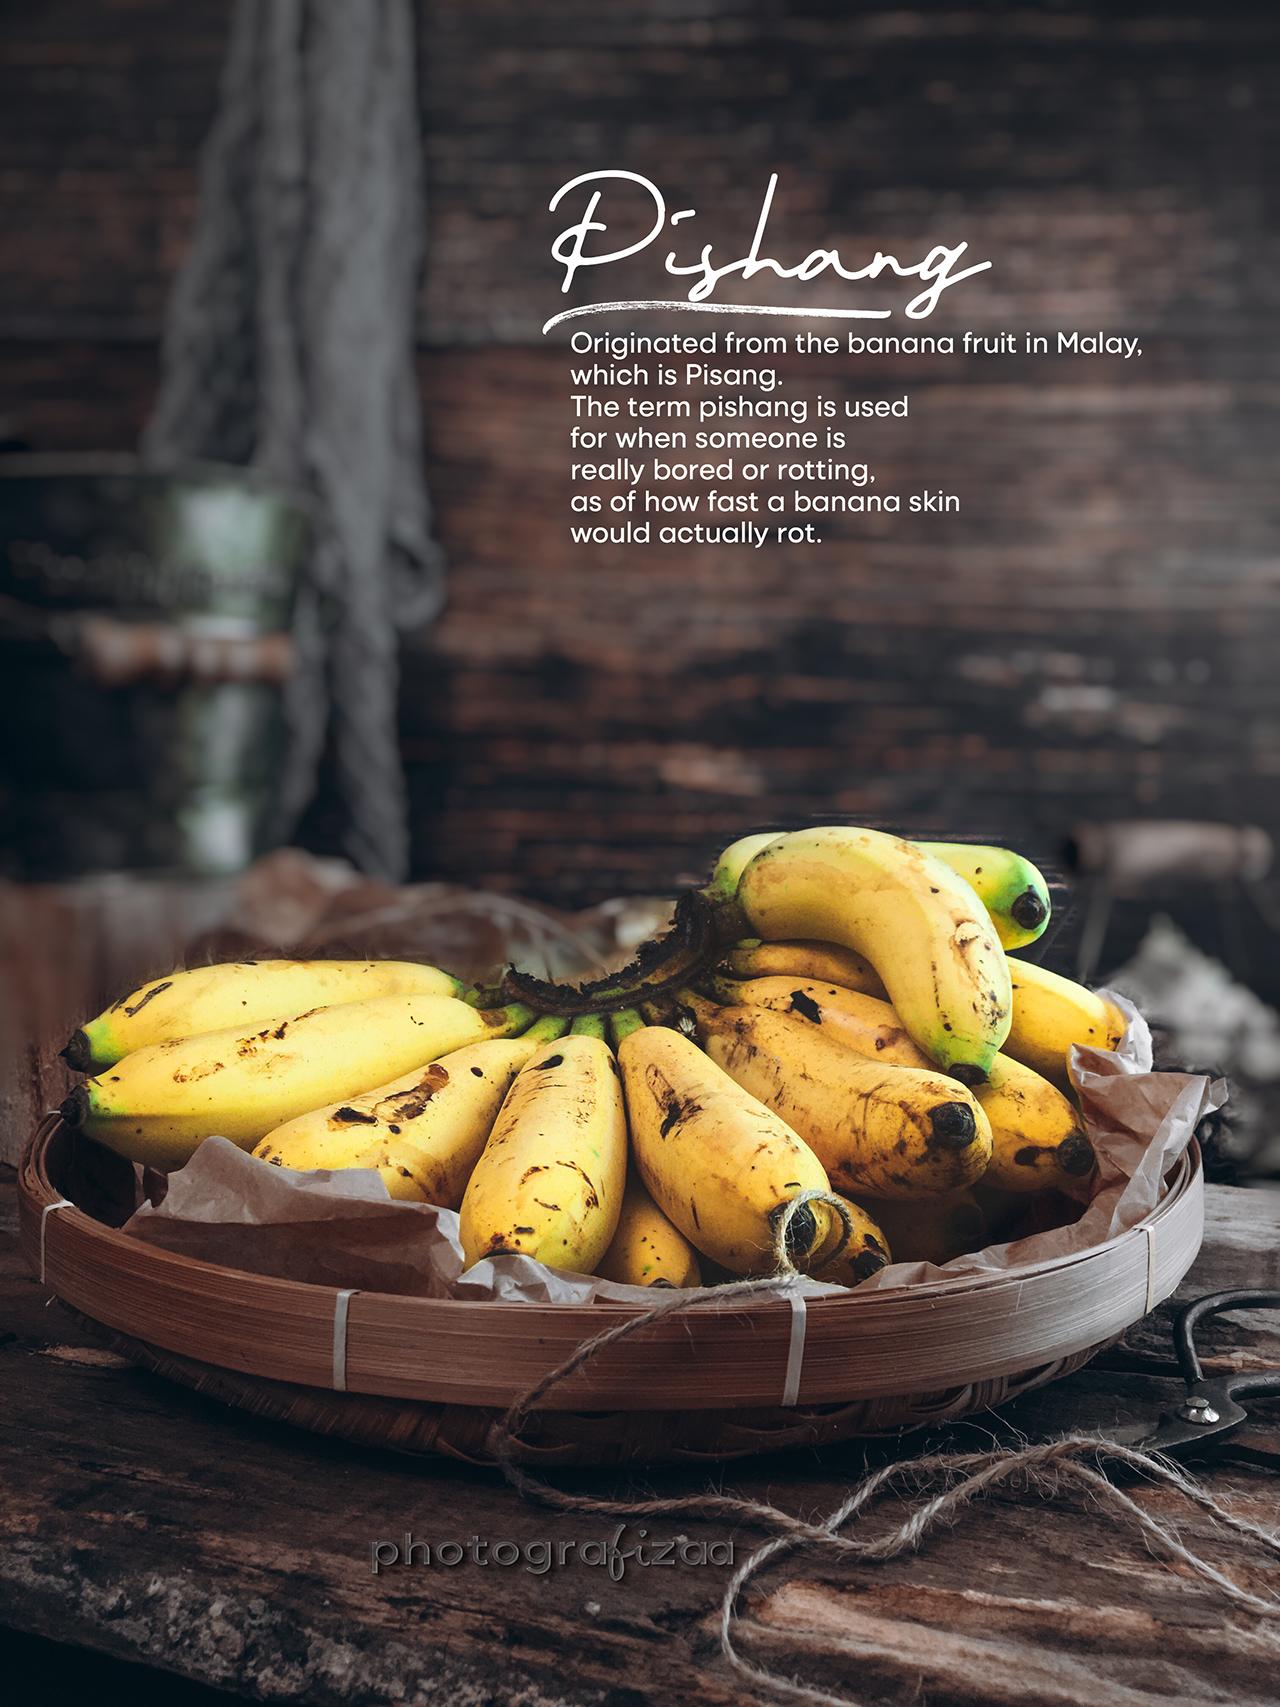 Pishang